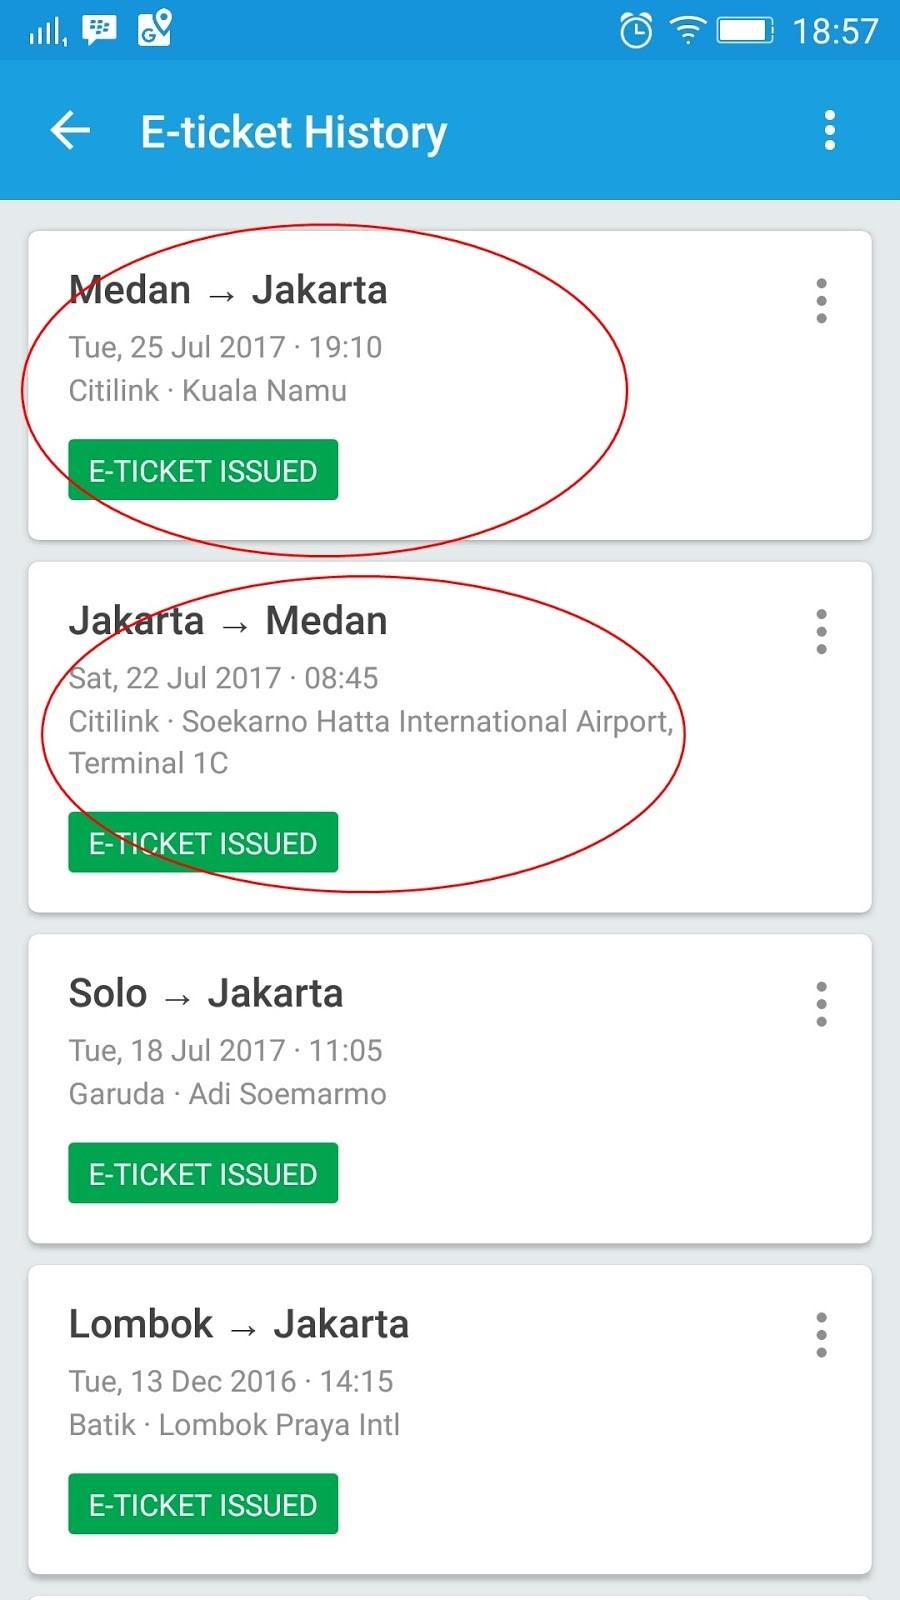 Yuk Berburu Tiket Pesawat Medan Jakarta Murah Krasnehracky